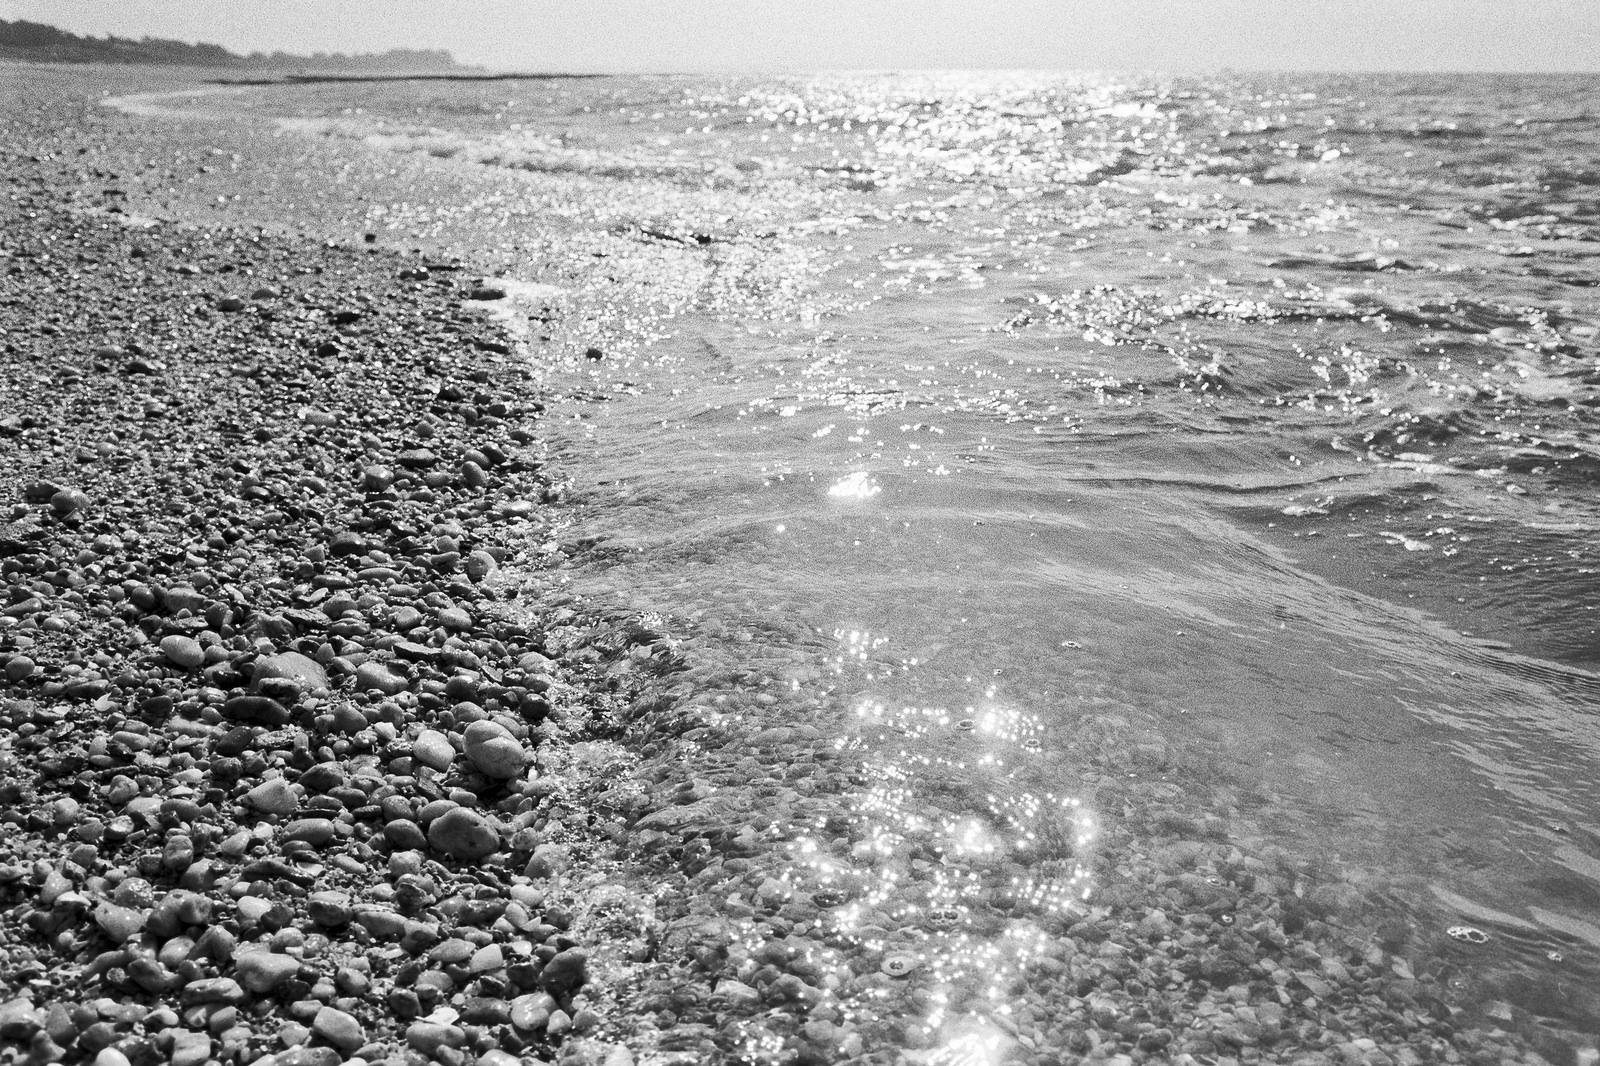 Marine flow - photography, istillshootfilm - nonophuran | ello